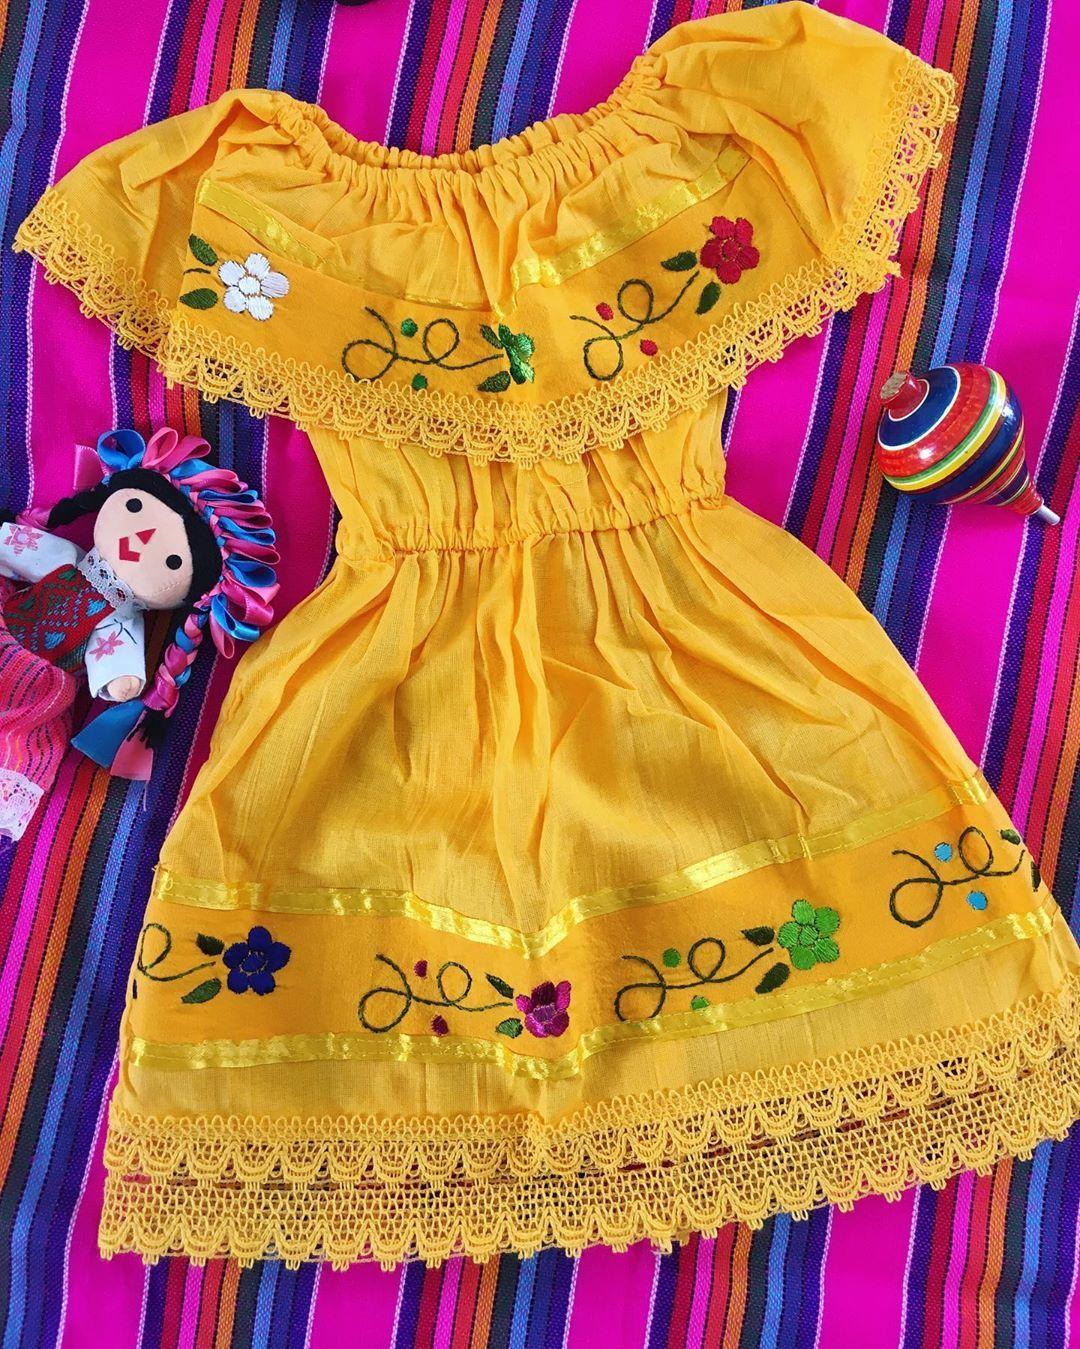 27 Me Gusta 0 Comentarios Italivy Italiviishop En Instagram A Very Traditional Mexican Traditional Mexican Dress Mexican Dresses Mexican Style Dresses [ 1349 x 1080 Pixel ]